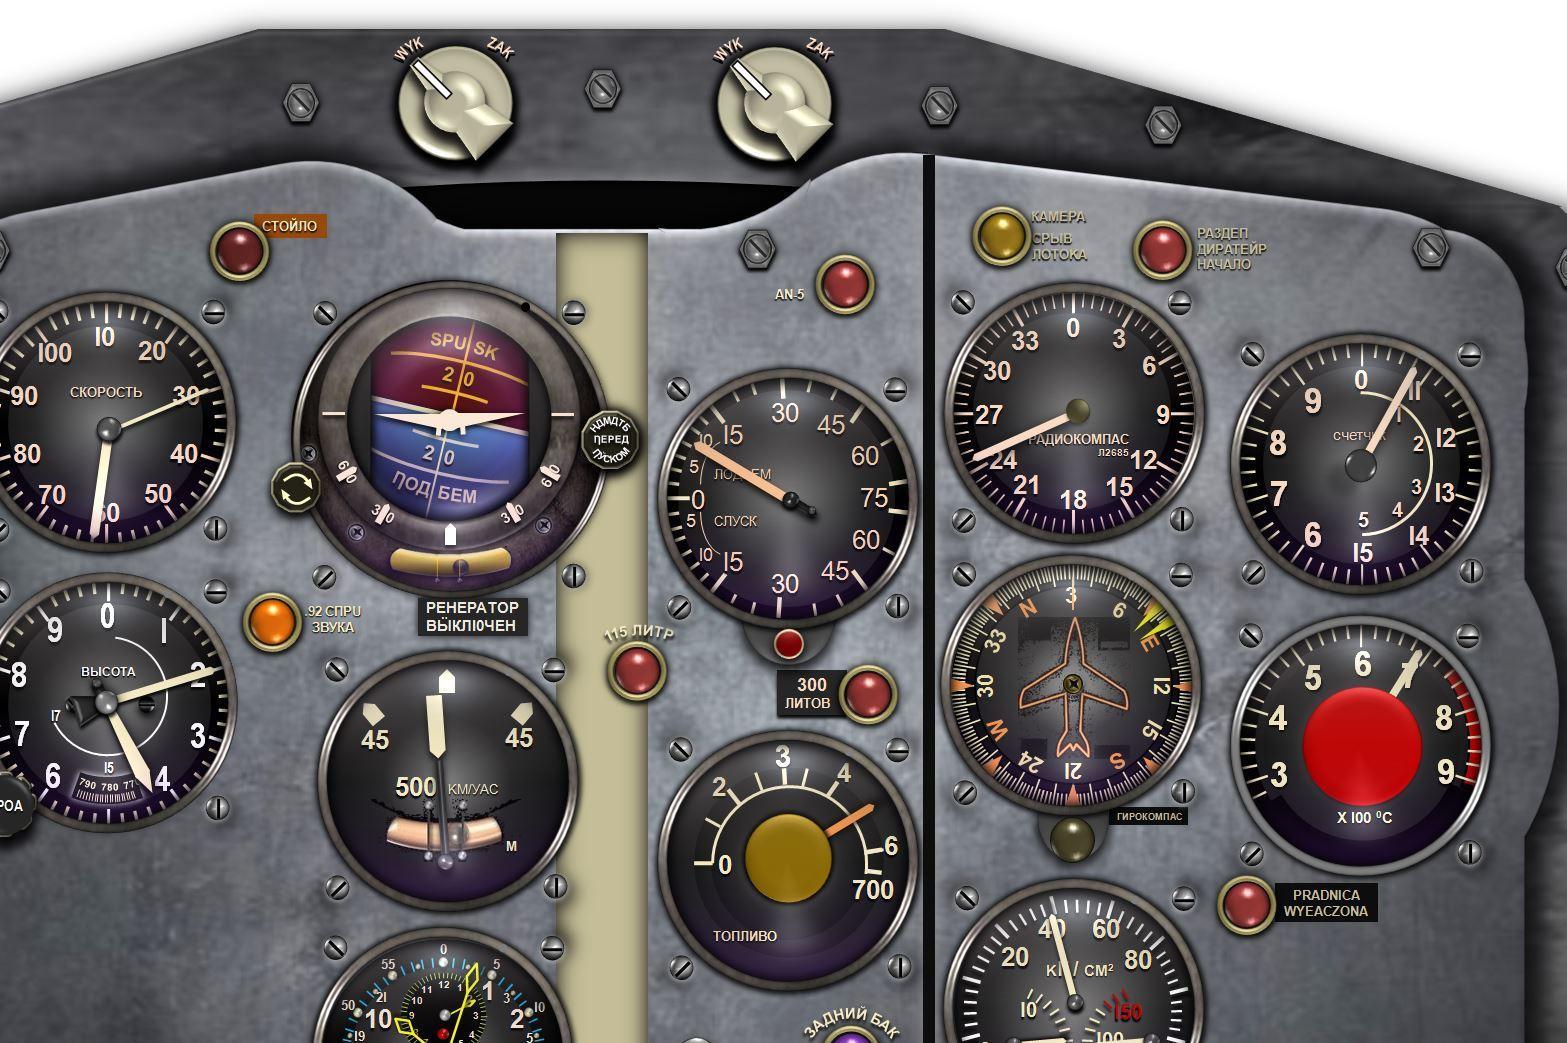 Click image for larger version  Name:MiG15-MiG17-SERIES-COCKPIT-instrument-panel-CDkit-_57-4.jpg Views:40 Size:247.3 KB ID:2250526